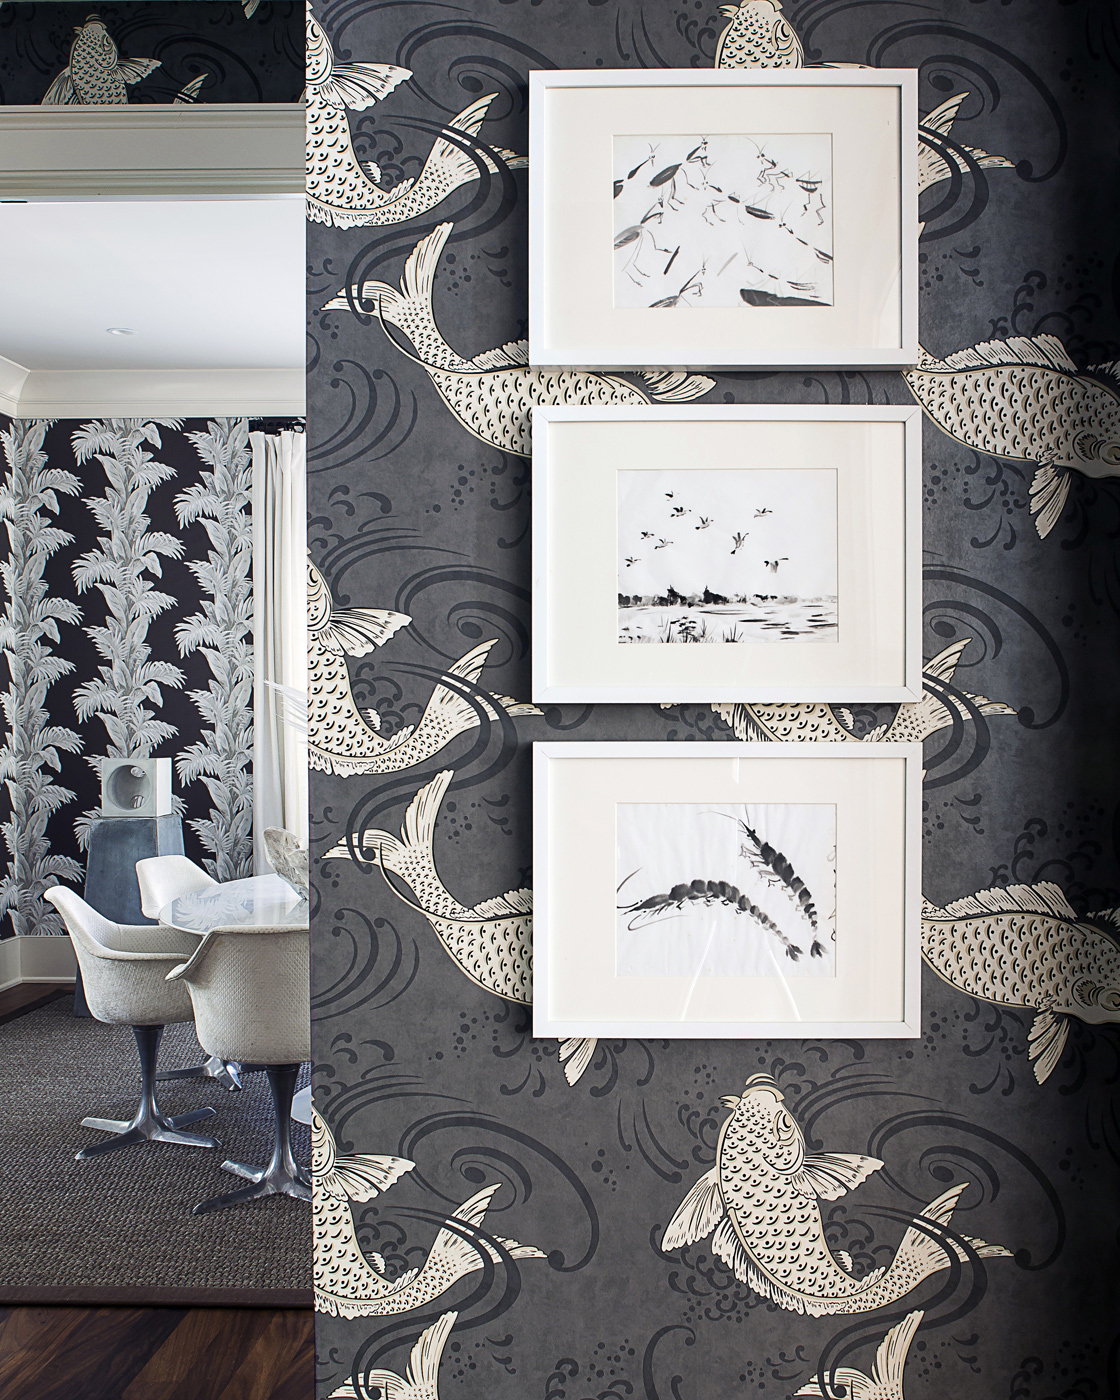 Nina Campbell koi wallpaper for Osborne & Little; coastal wildlife artwork; vacation design; island interior | Savage Interior Design